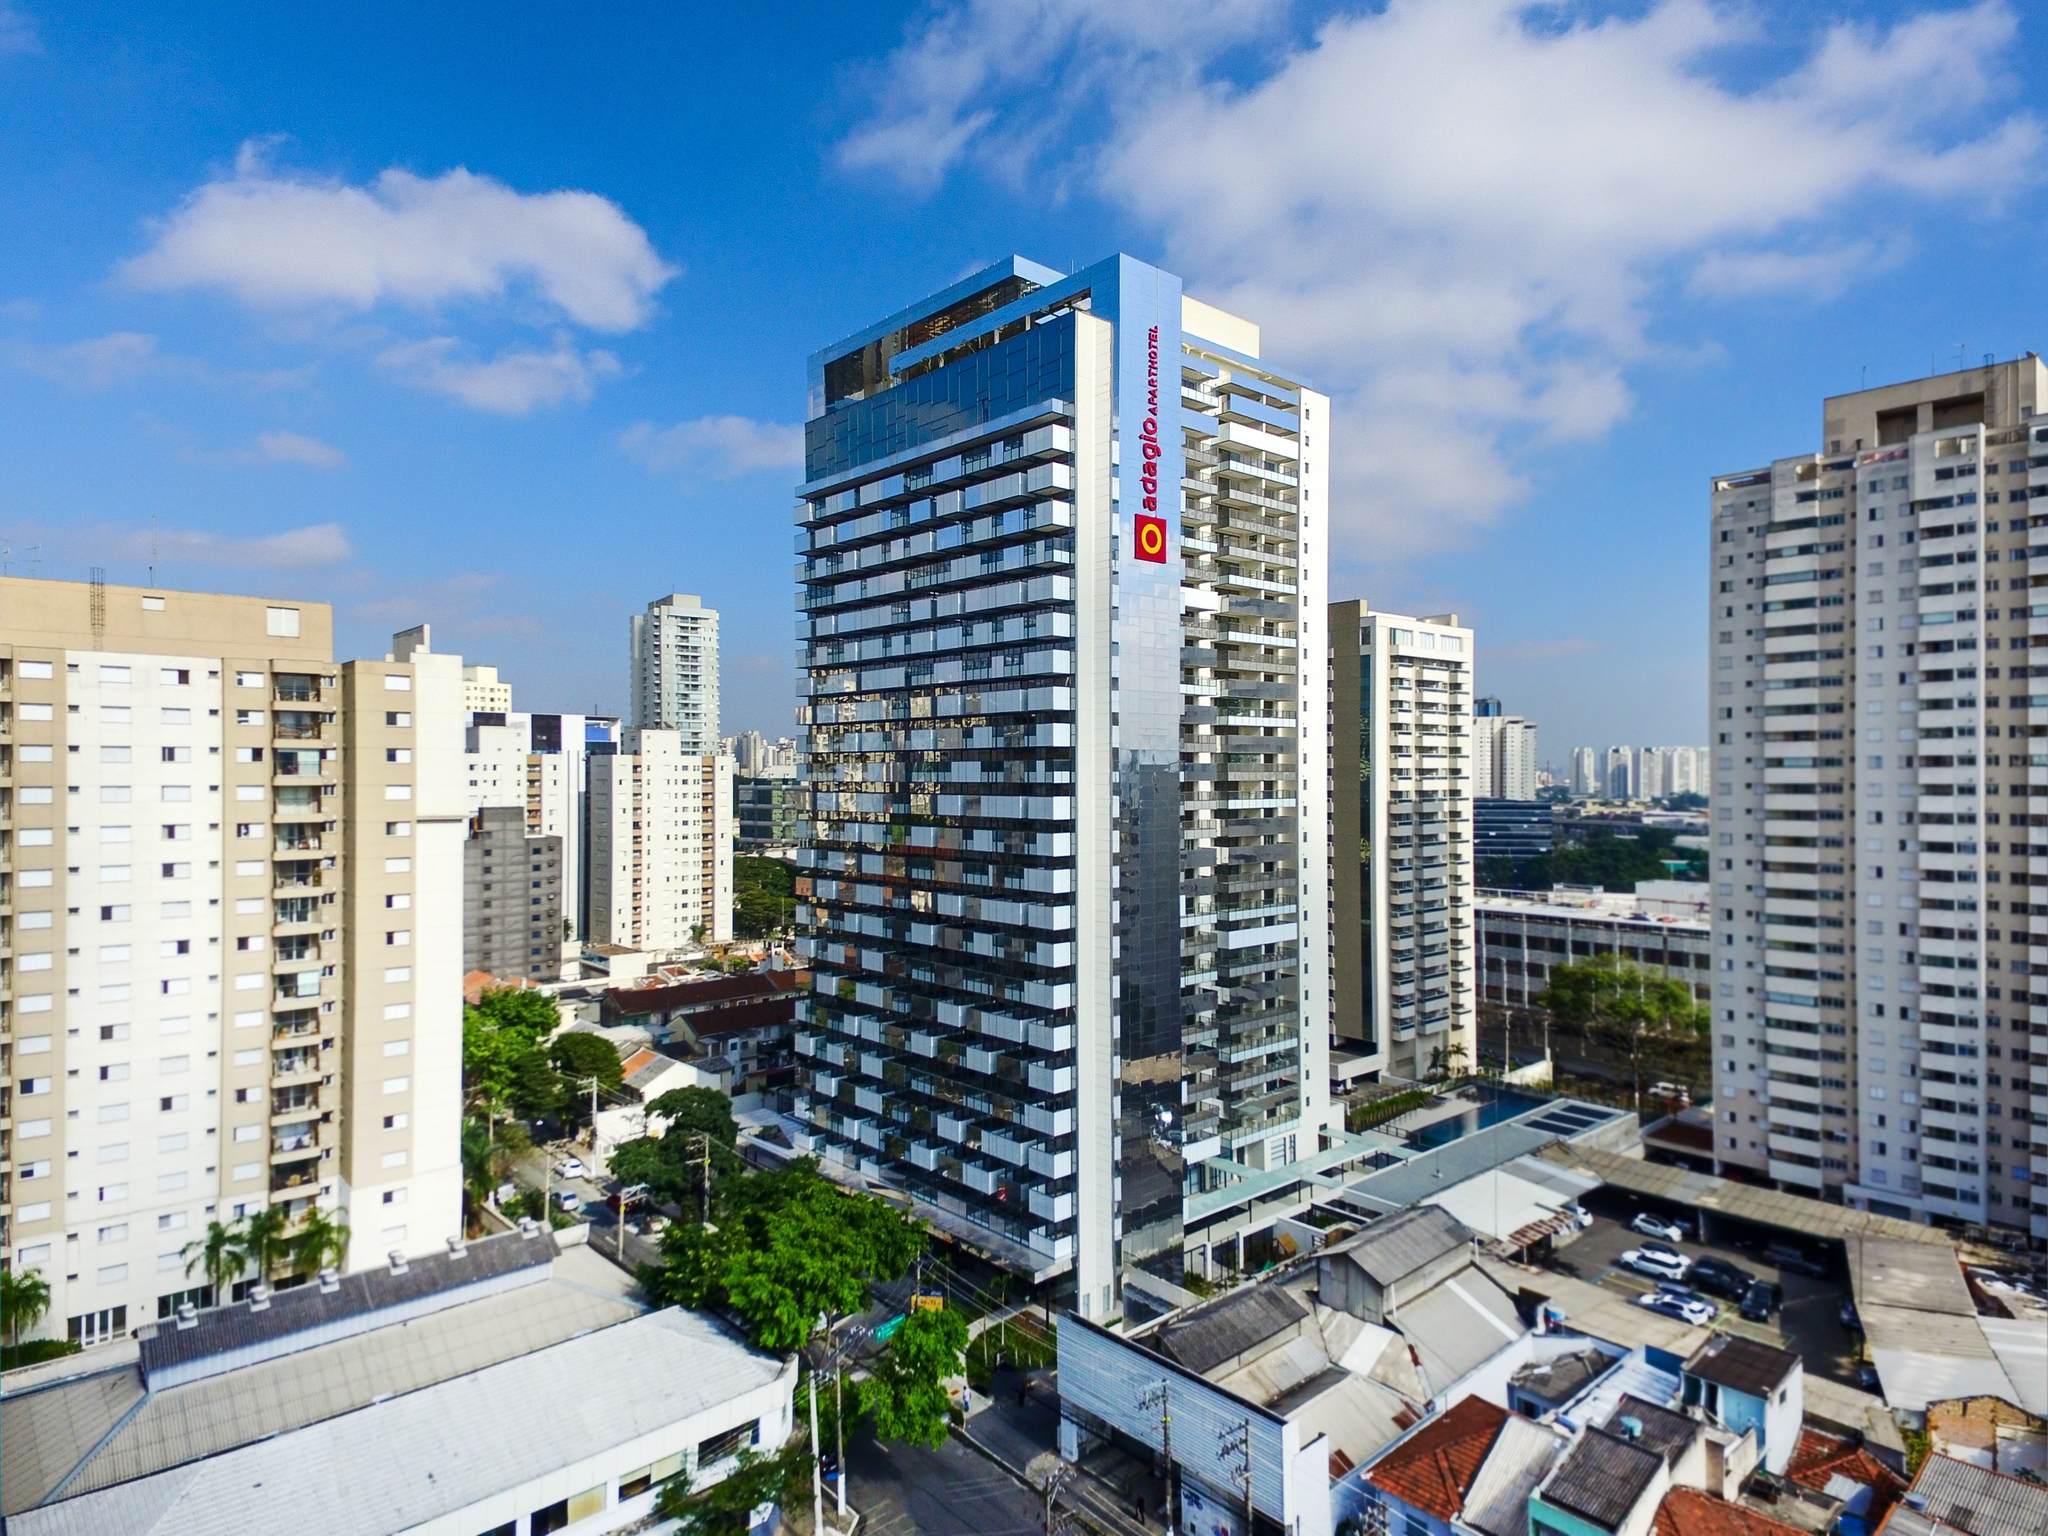 Отель — Апарт-отель Adagio Сан-Паулу Барра-Фунда